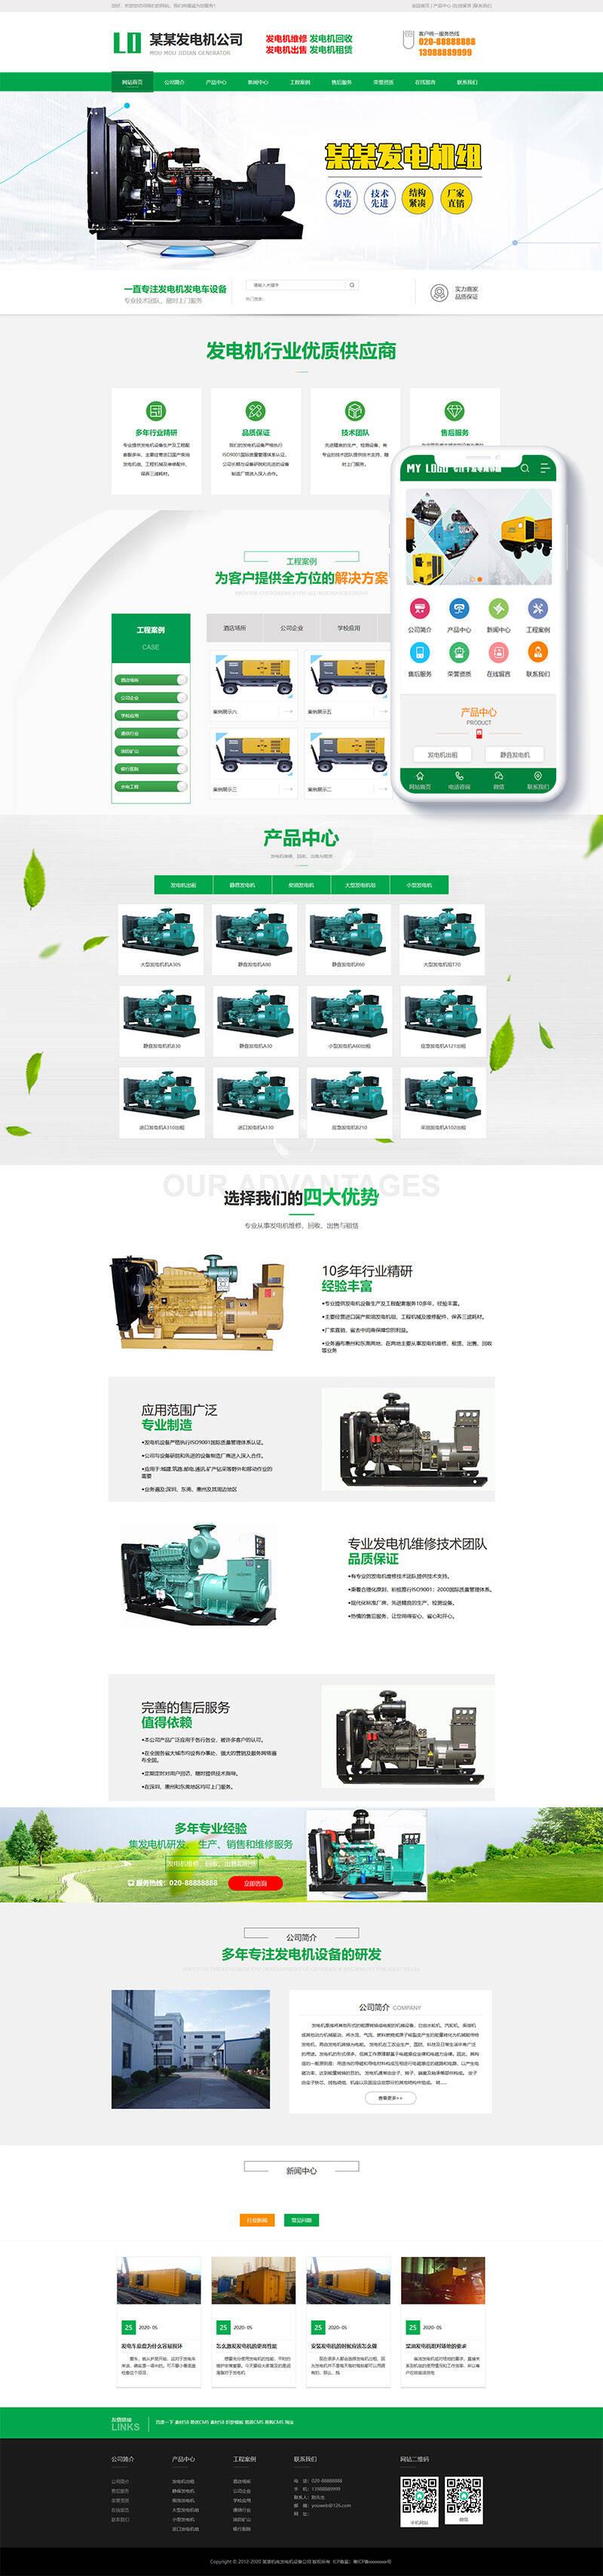 www.wawaapp.cn_织梦营销型发电机机电机械设备类网站织梦模板(带手机端)插图